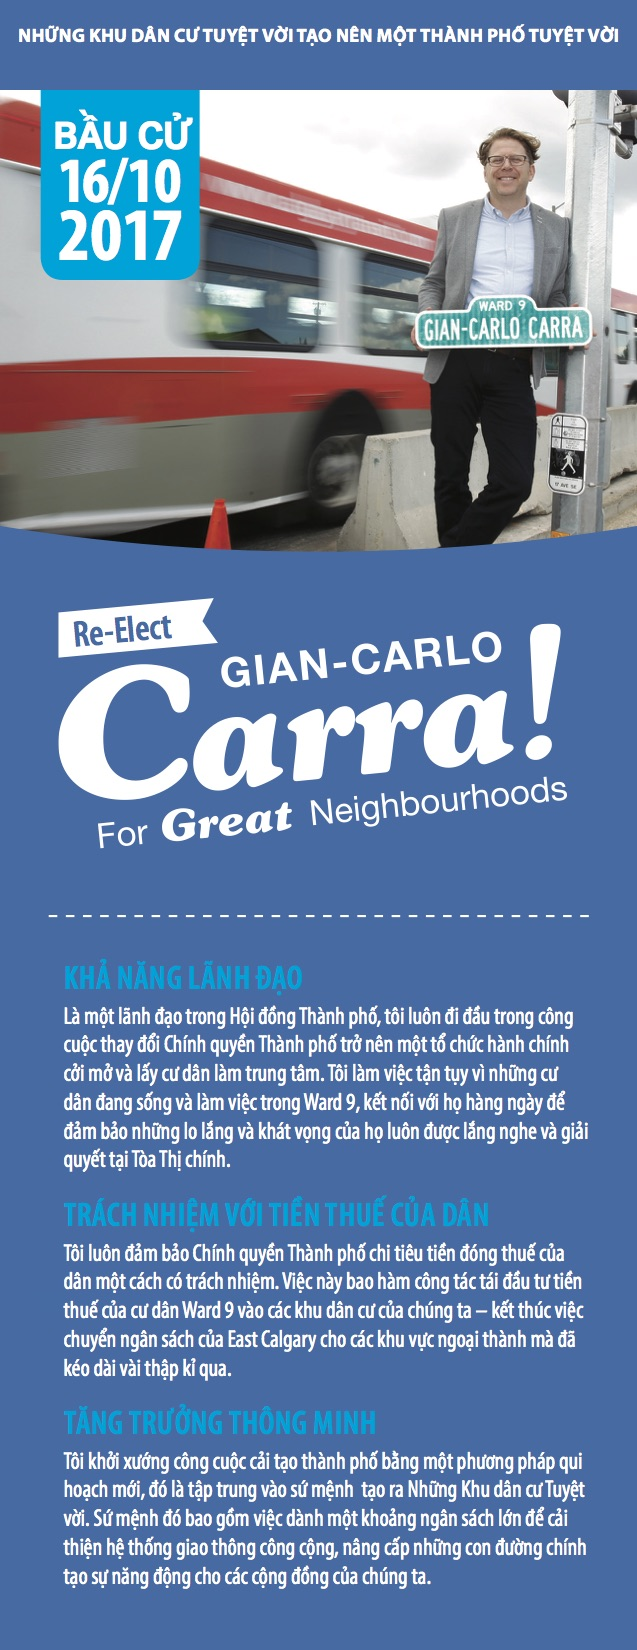 Re-Elect_Gian-Carlo_Carra_(Vietnamese).jpg